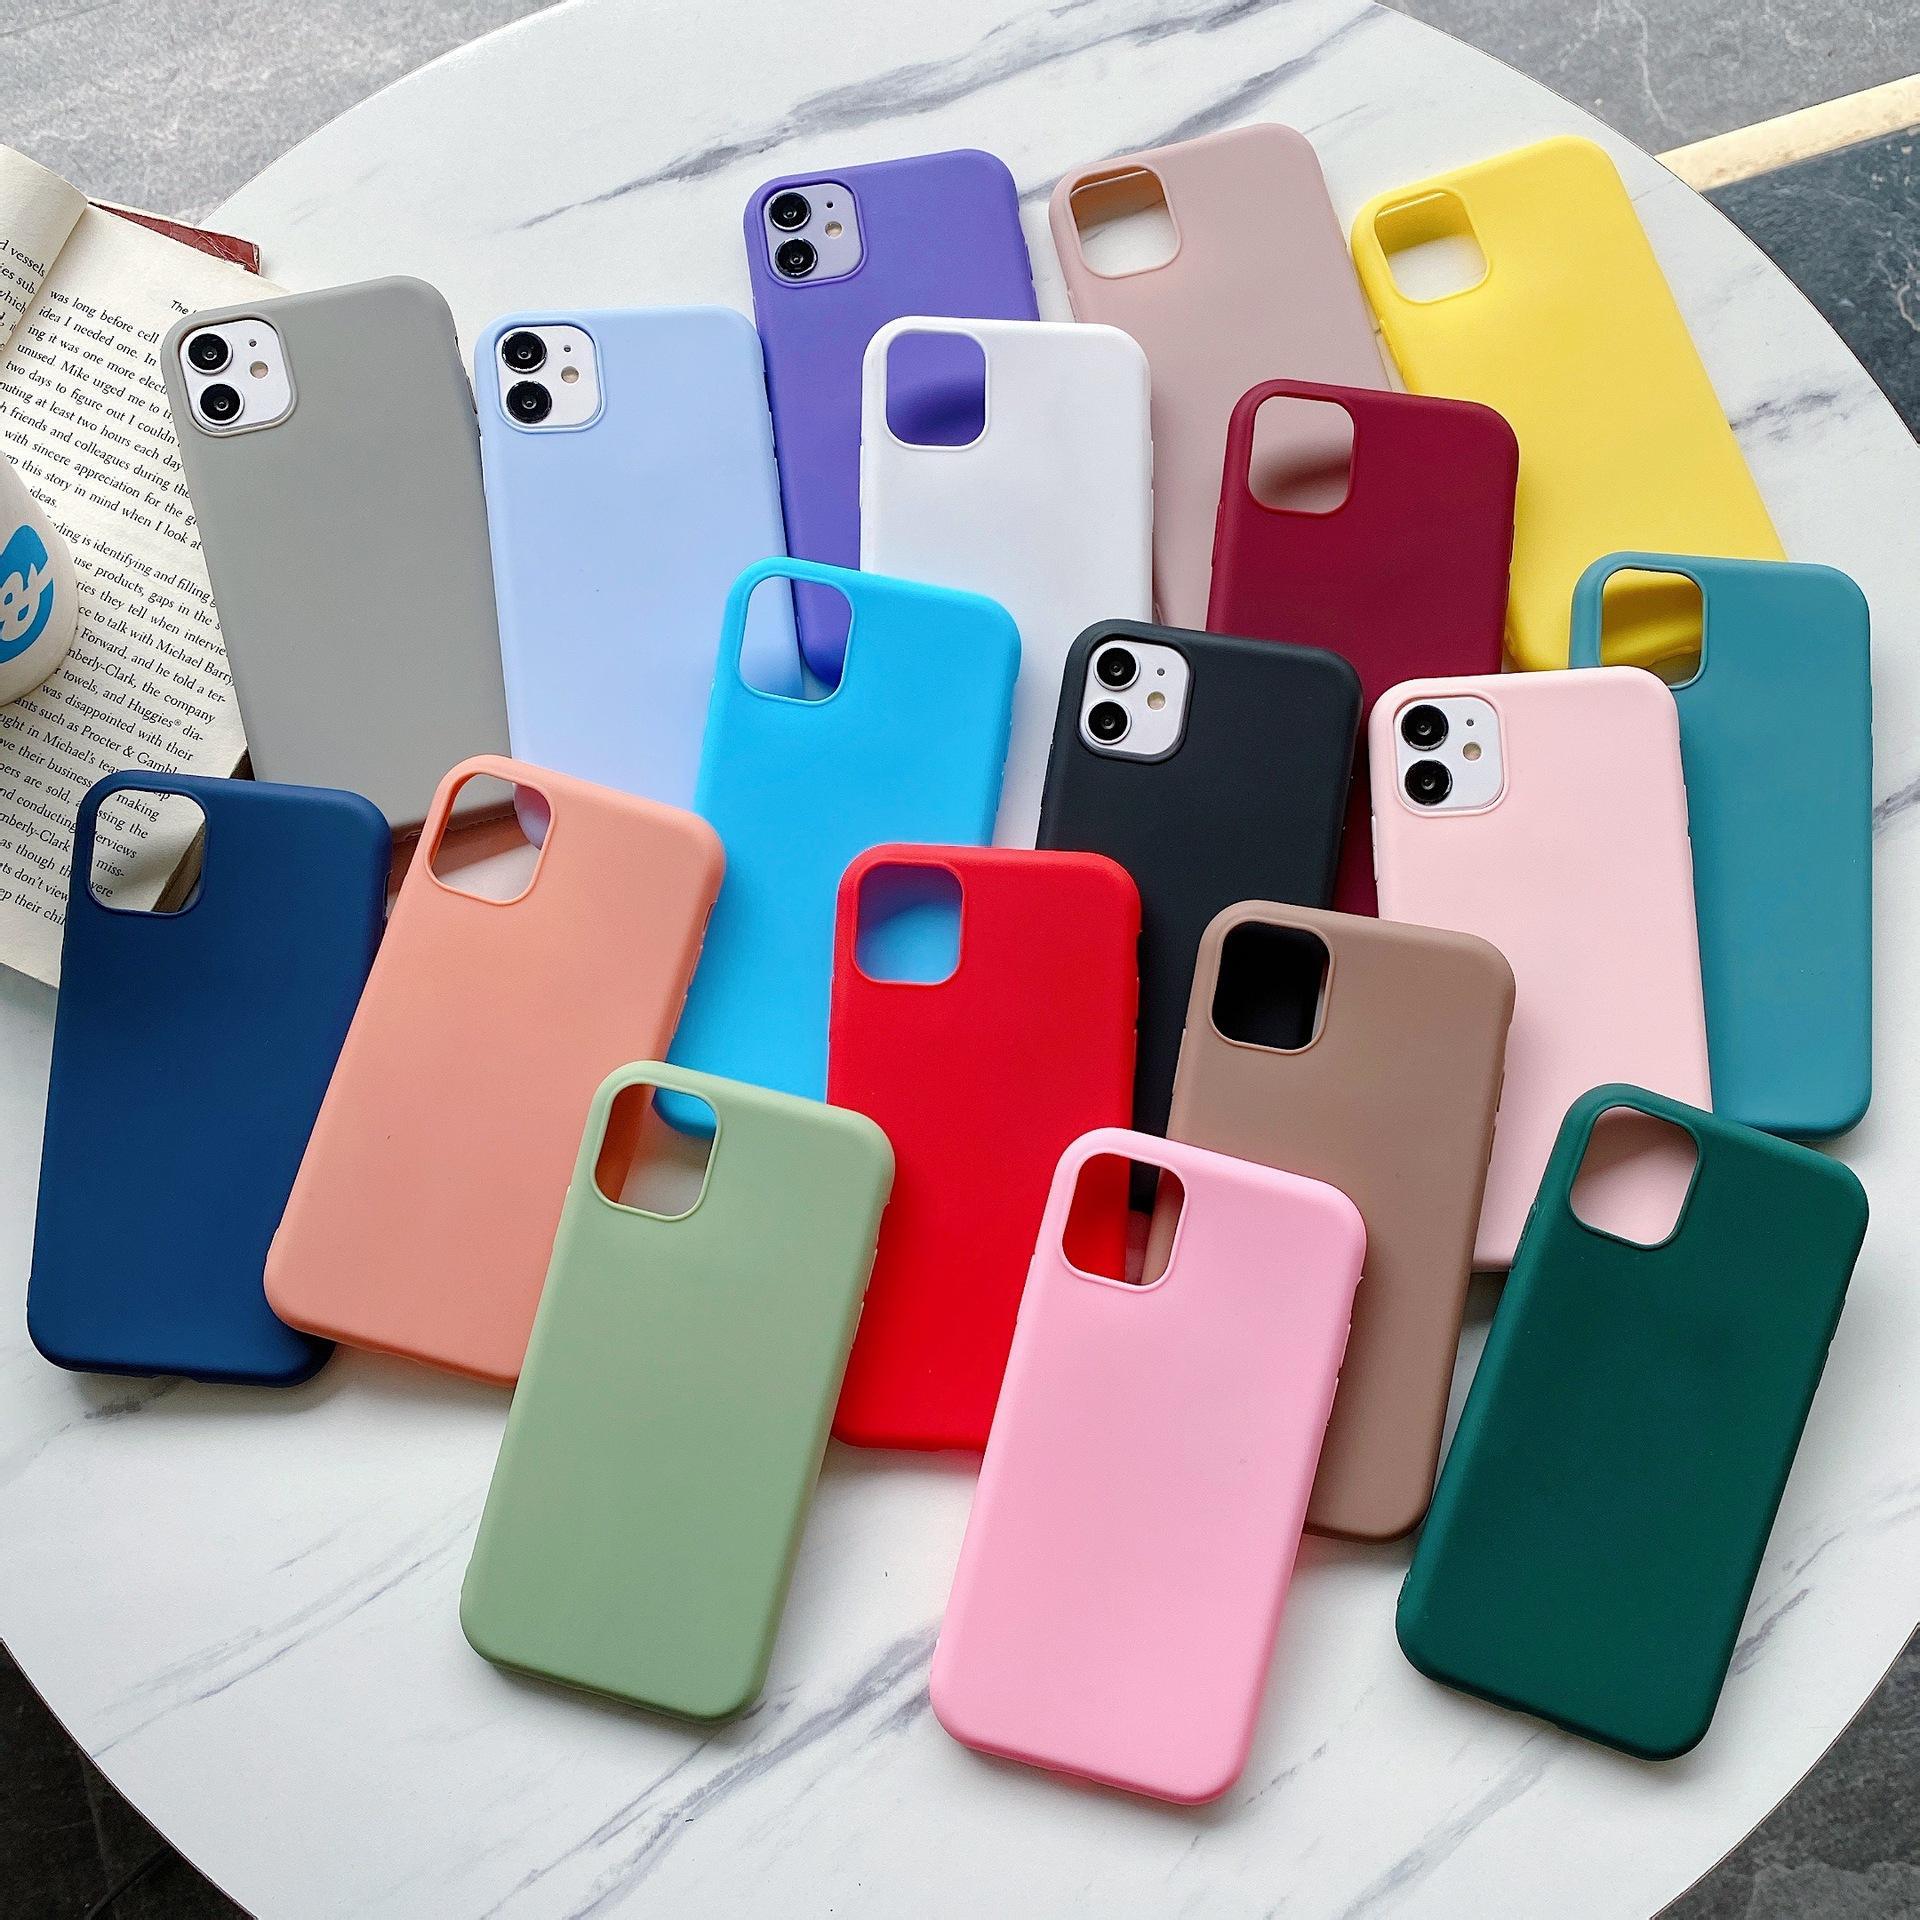 Custodia morbida opaca per iPhone 12 Pro Max 11 Pro X XS XR 8 7 6S Plus Back Protector Cover